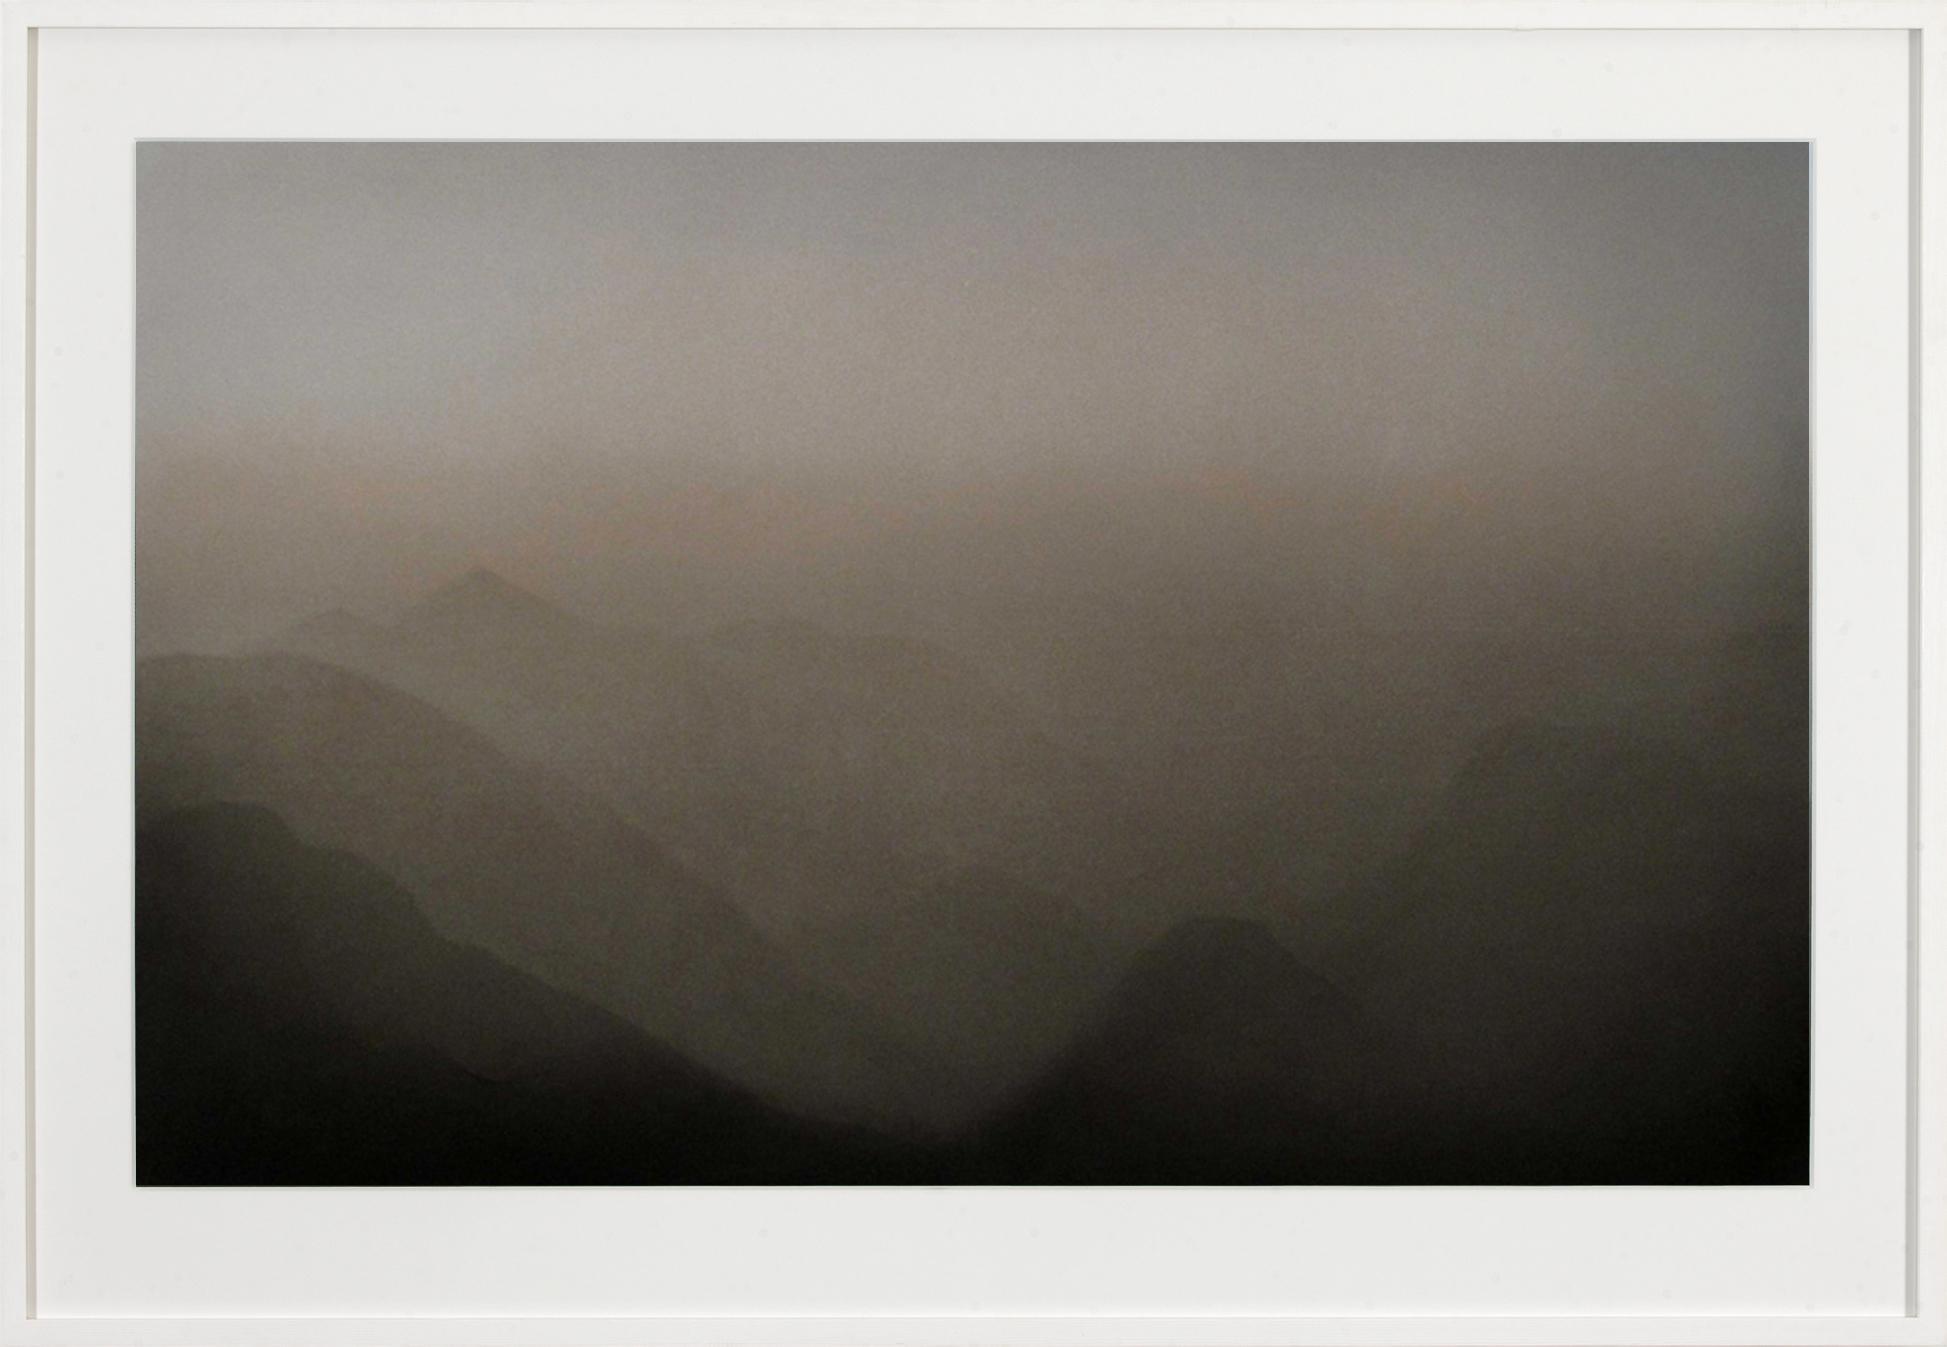 Petra-Lindholm-Untitled-I-inkjet-print-hand-colored-41.5x66.7cm-2012.jpg